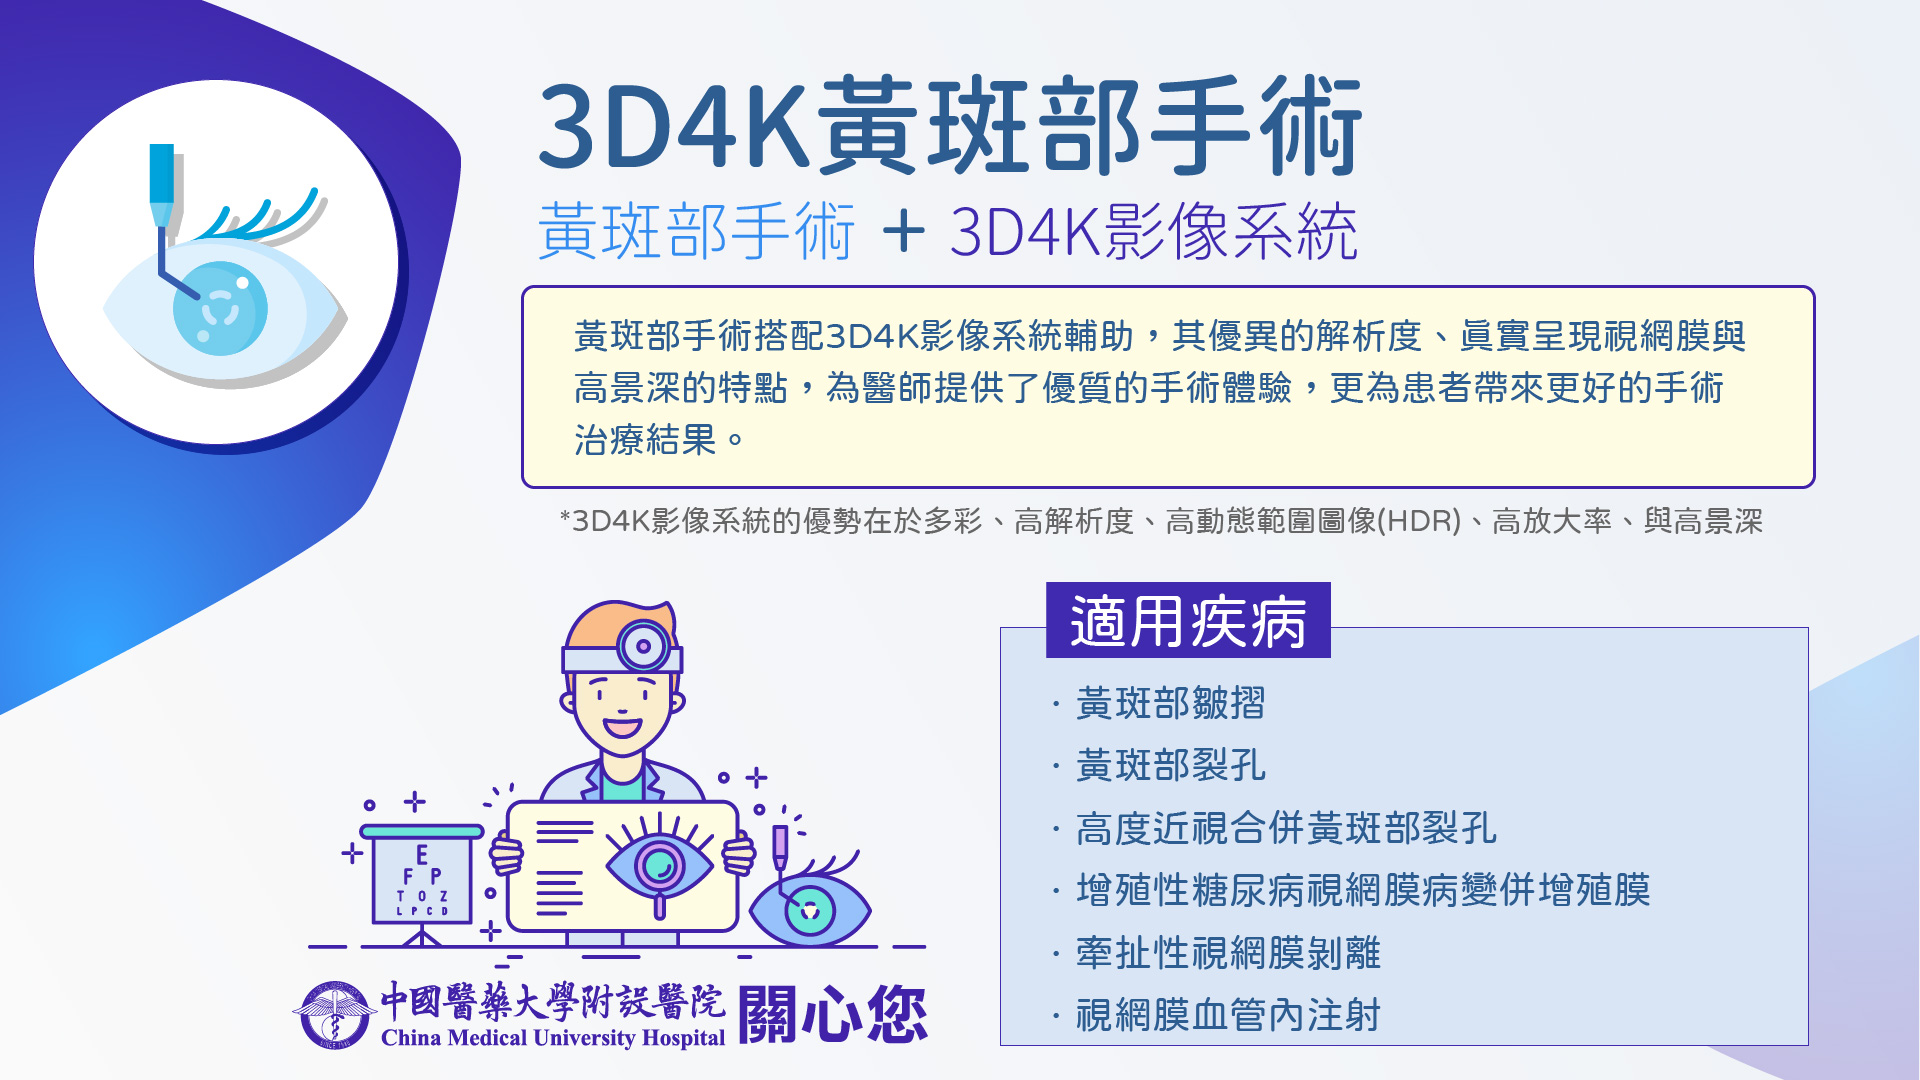 3D4K黃斑部手術介紹